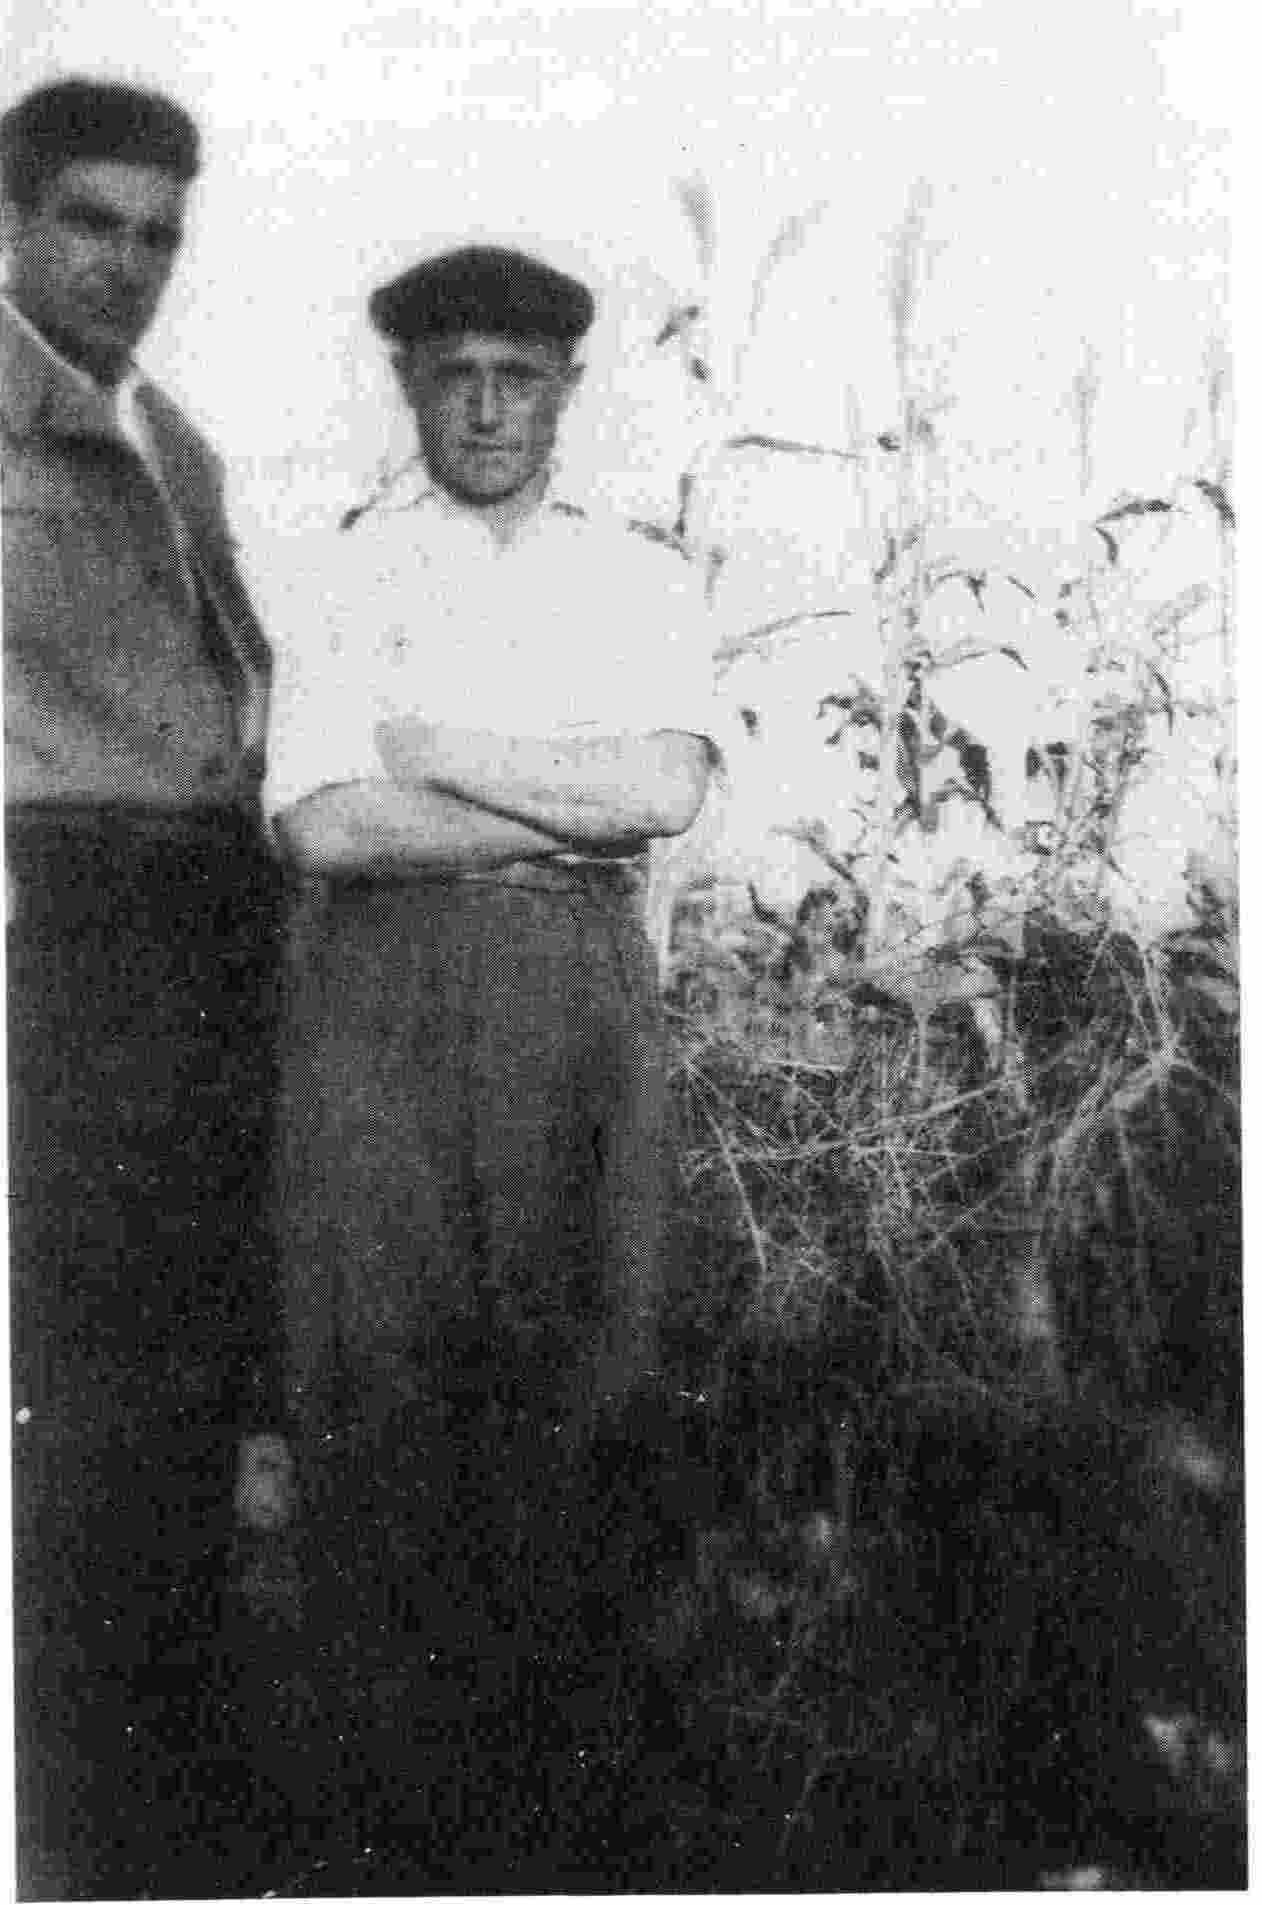 Dom Nikolle Mazreku dhe Pader Gardini, Saver, viti 1955